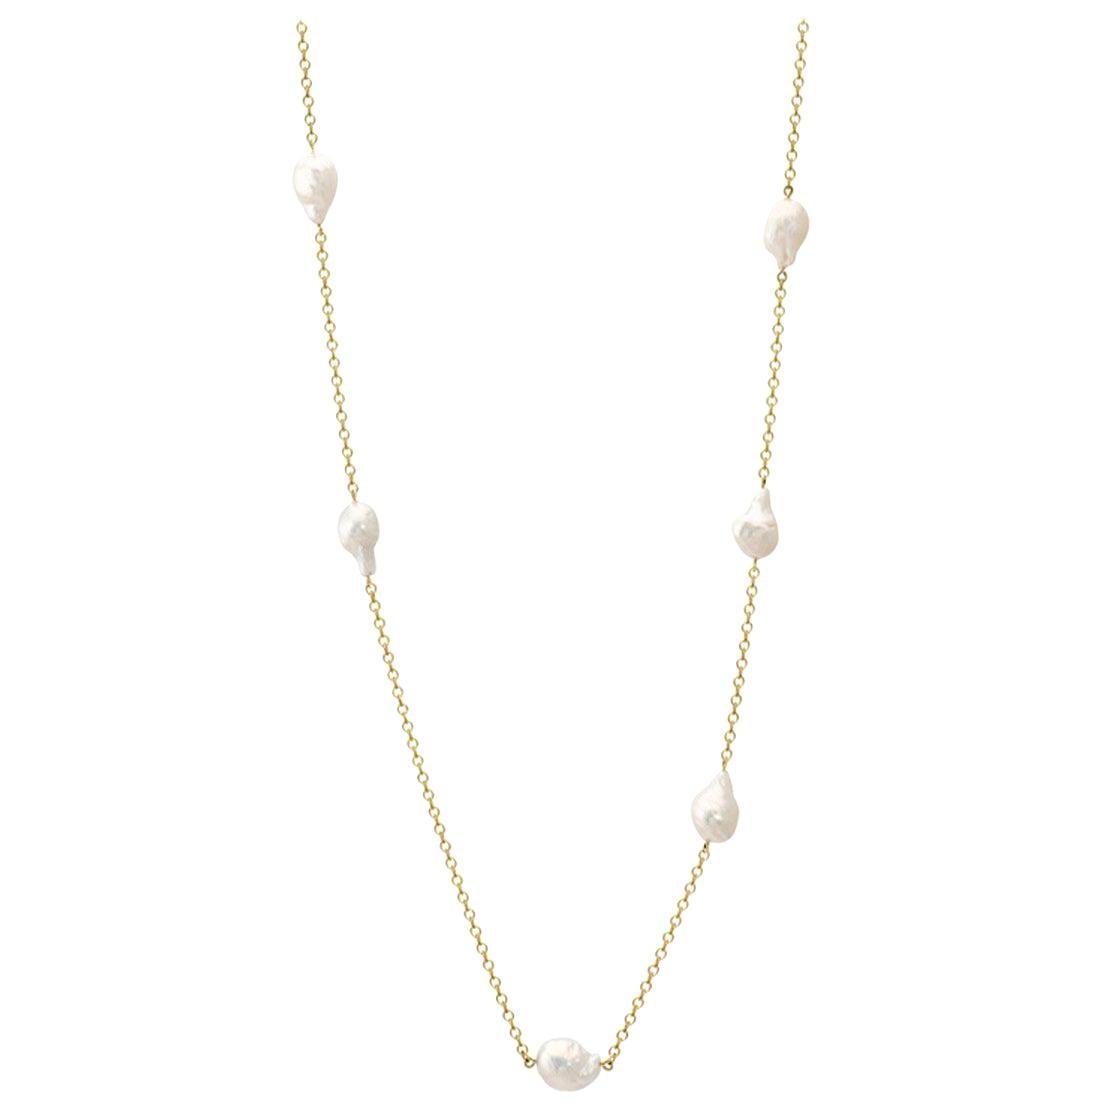 Cassandra Goad Polyphemus Baroque Pearl Necklace